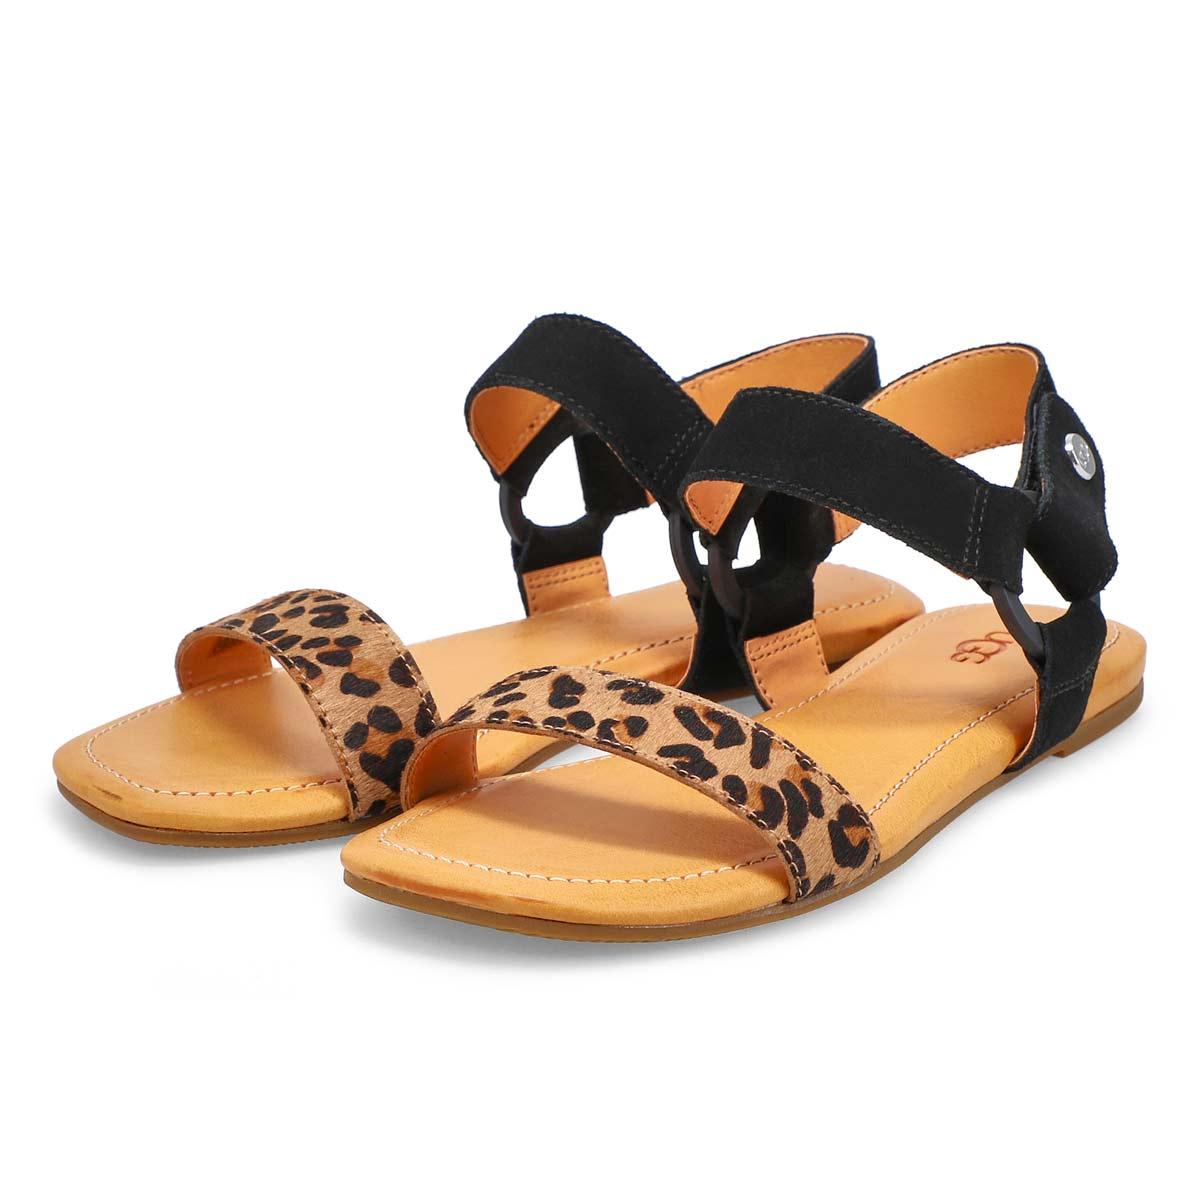 Women's Rynell Leopard Sandal - Black Tan